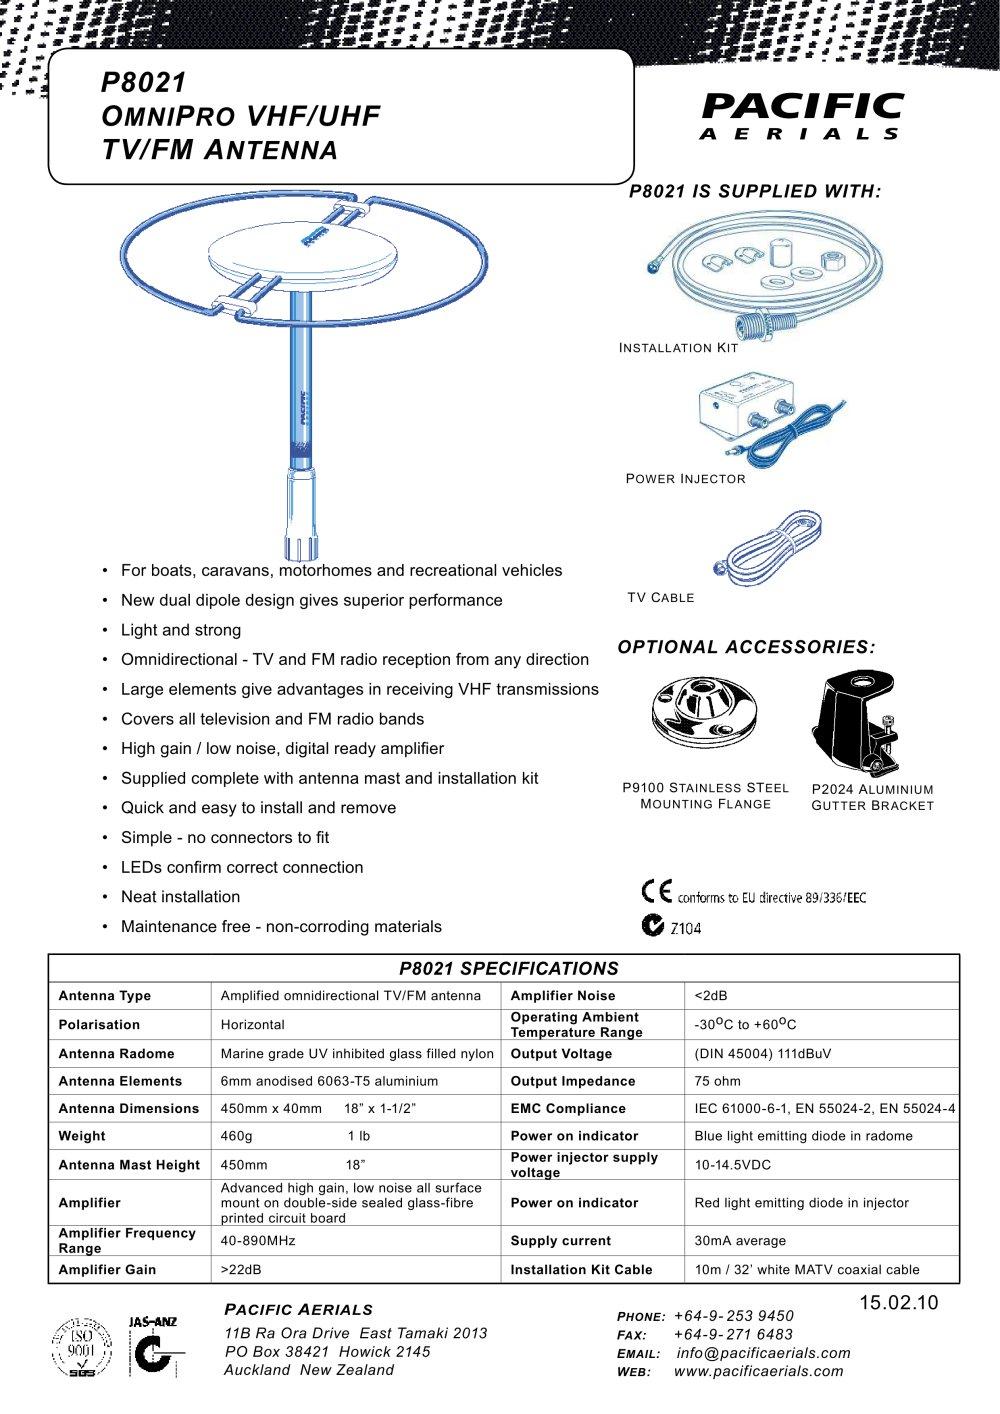 Uhf Vhf Antenna Wiring Diagram Schematics P8021 Omnipro Tv Fm Pacific Aerials Pdf Radio Ham